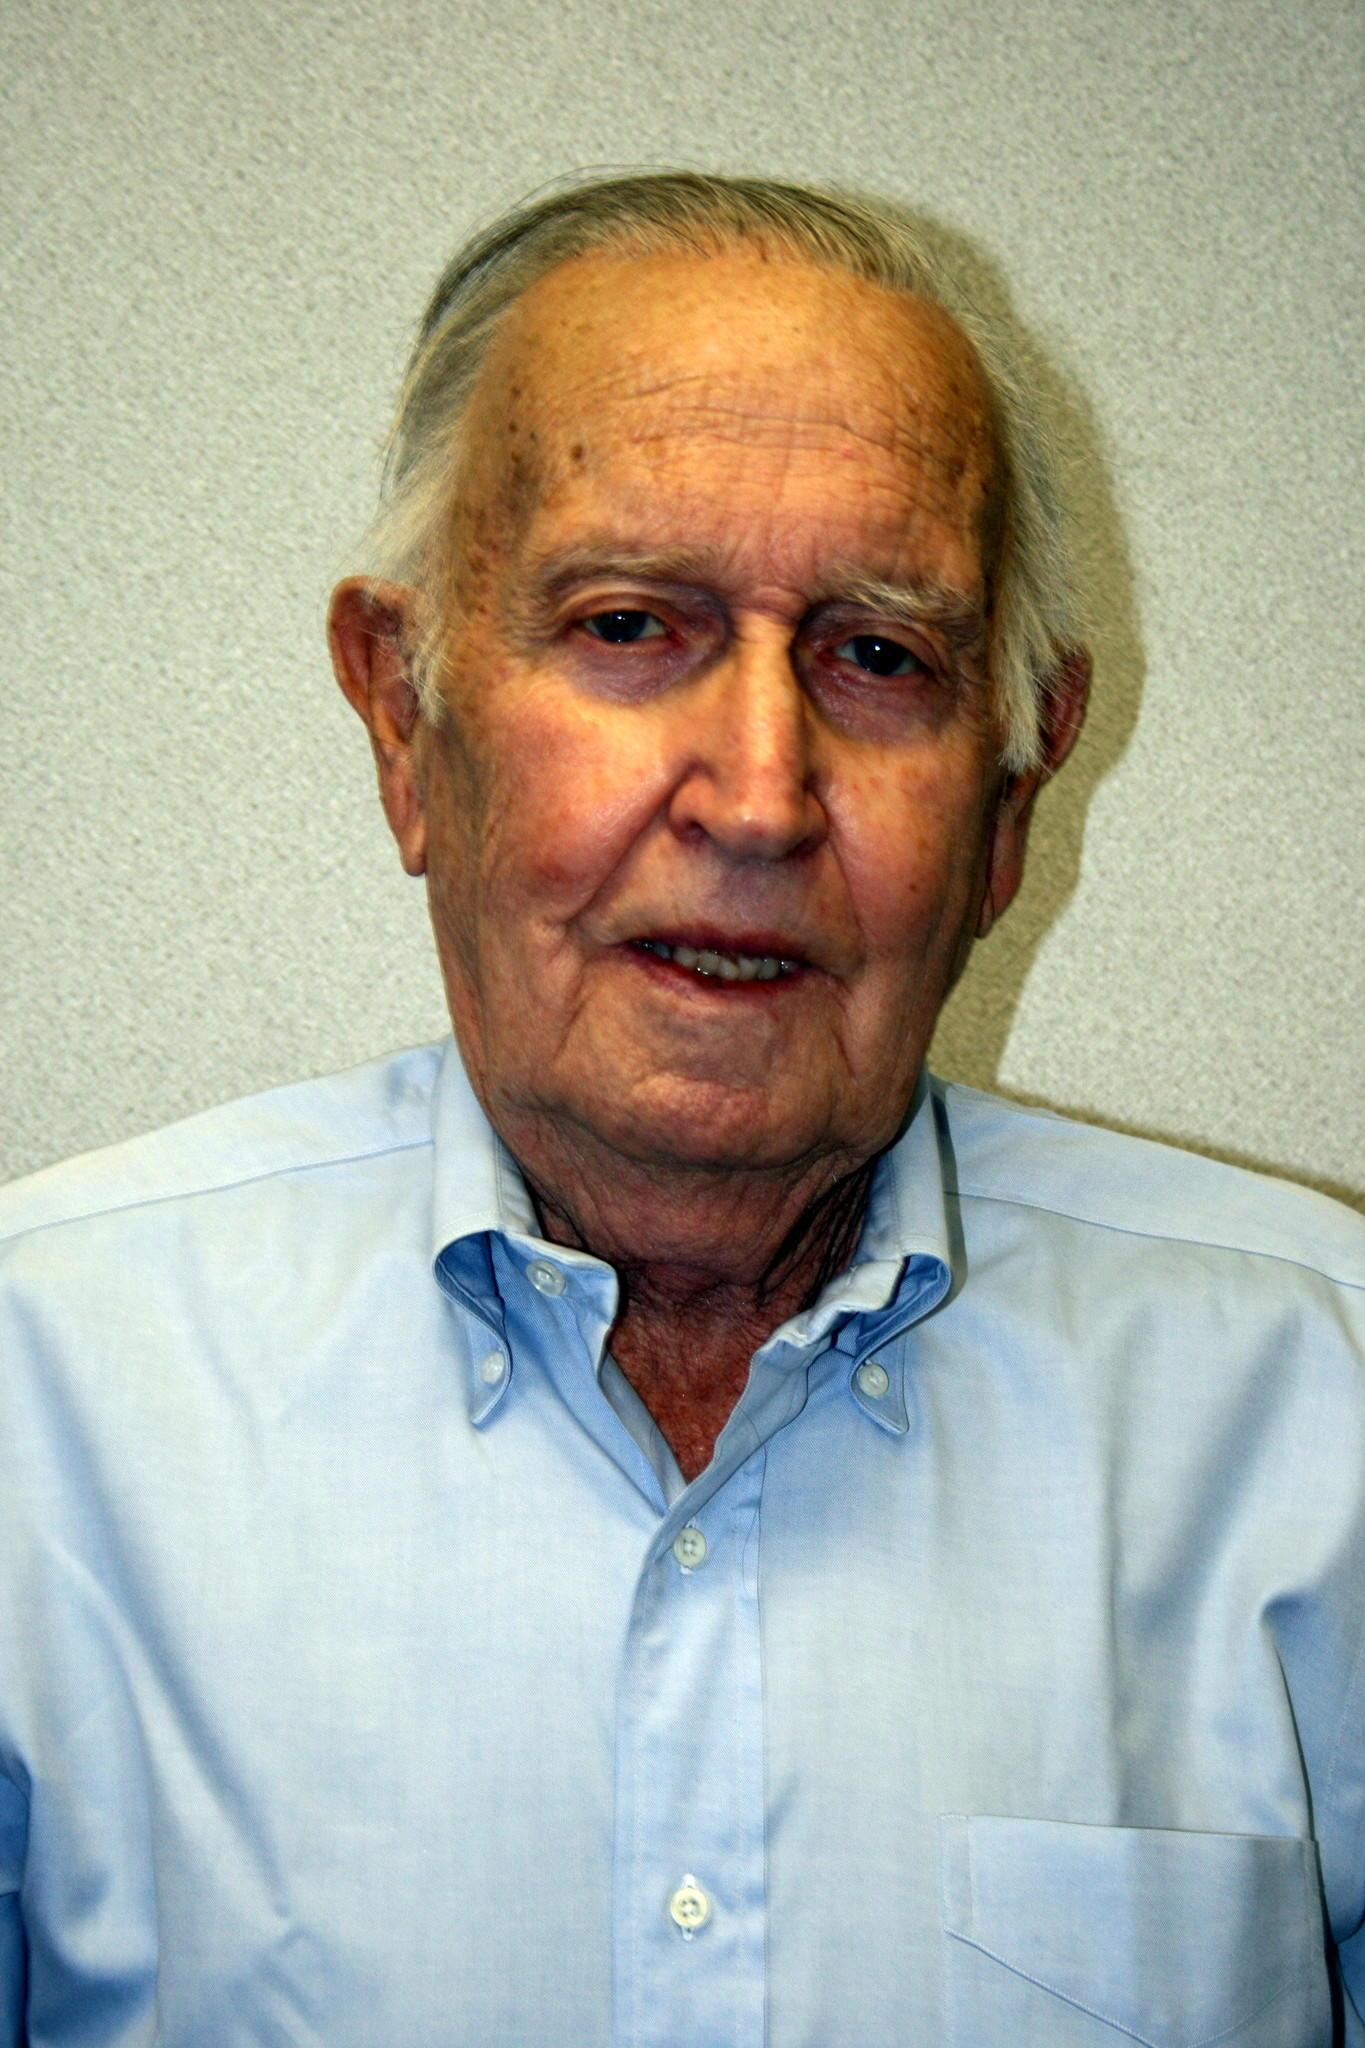 Lou Treadway